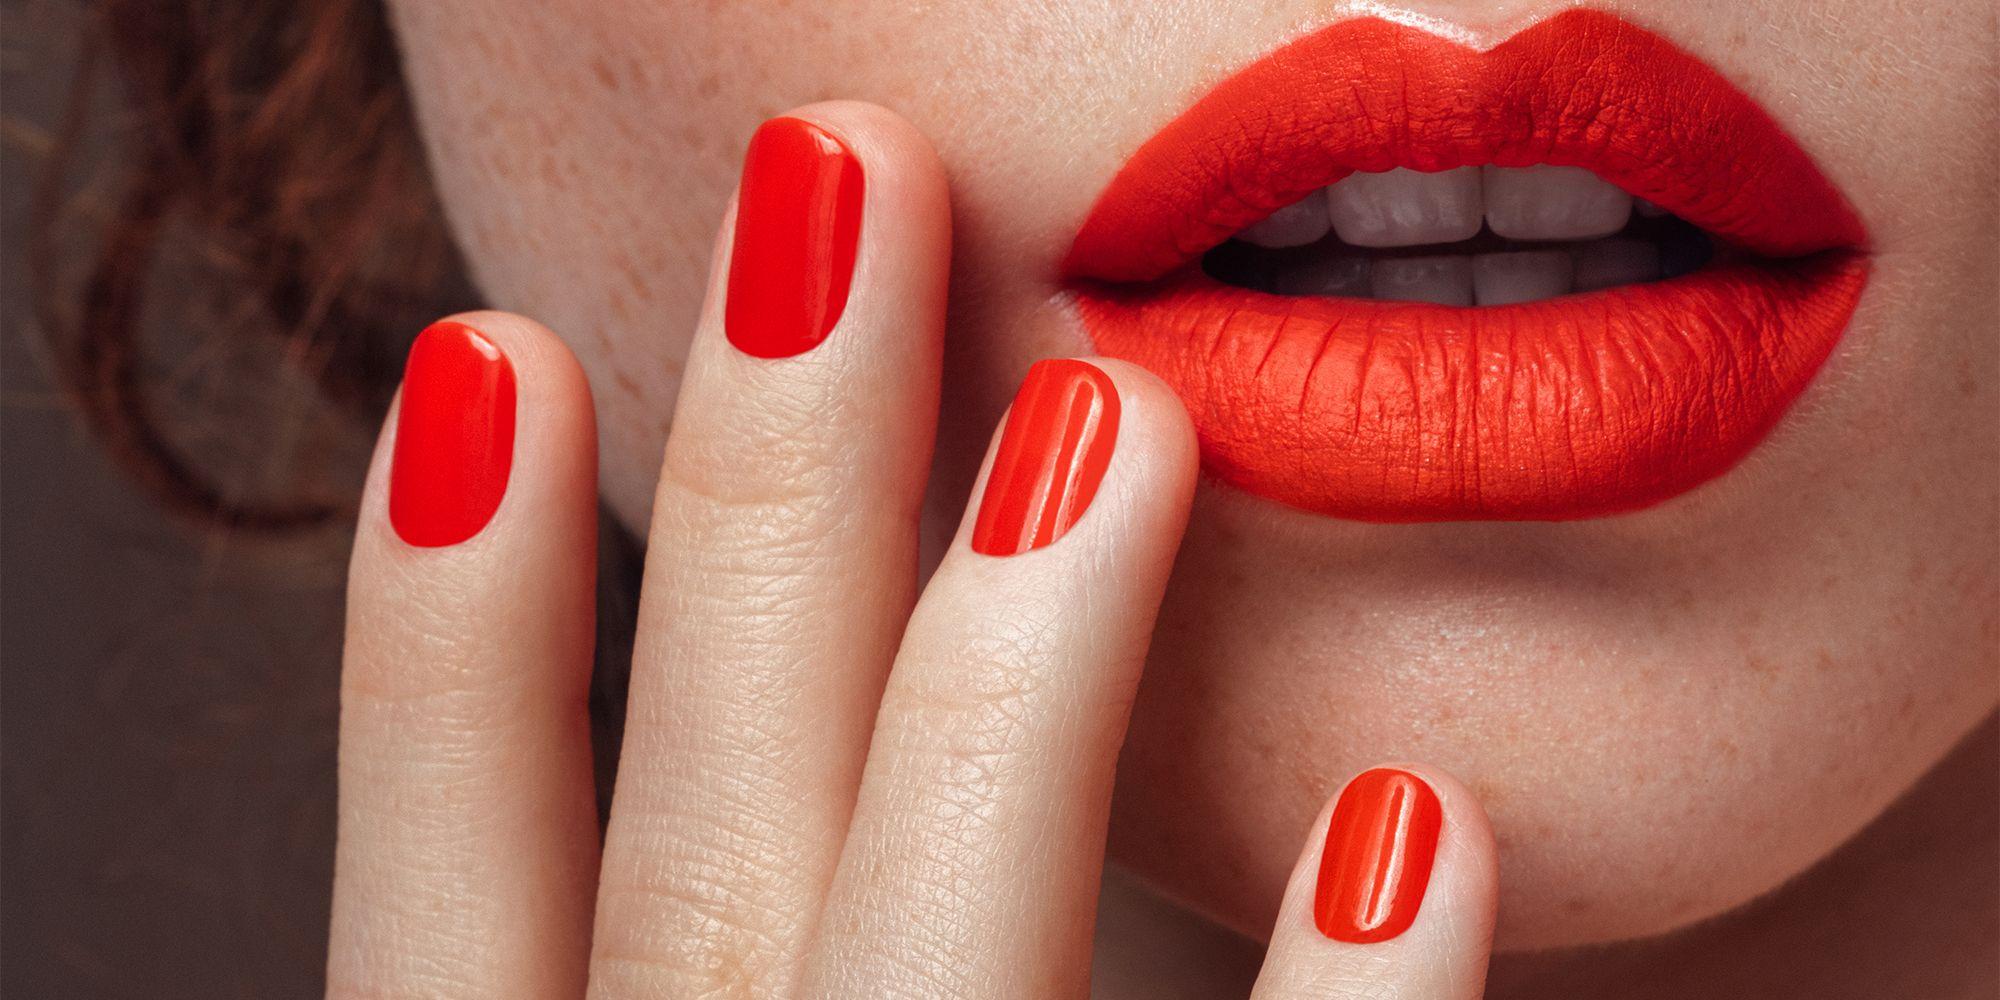 Nail Polish Trends, Nail Design \u0026 Art Ideas and Manicure